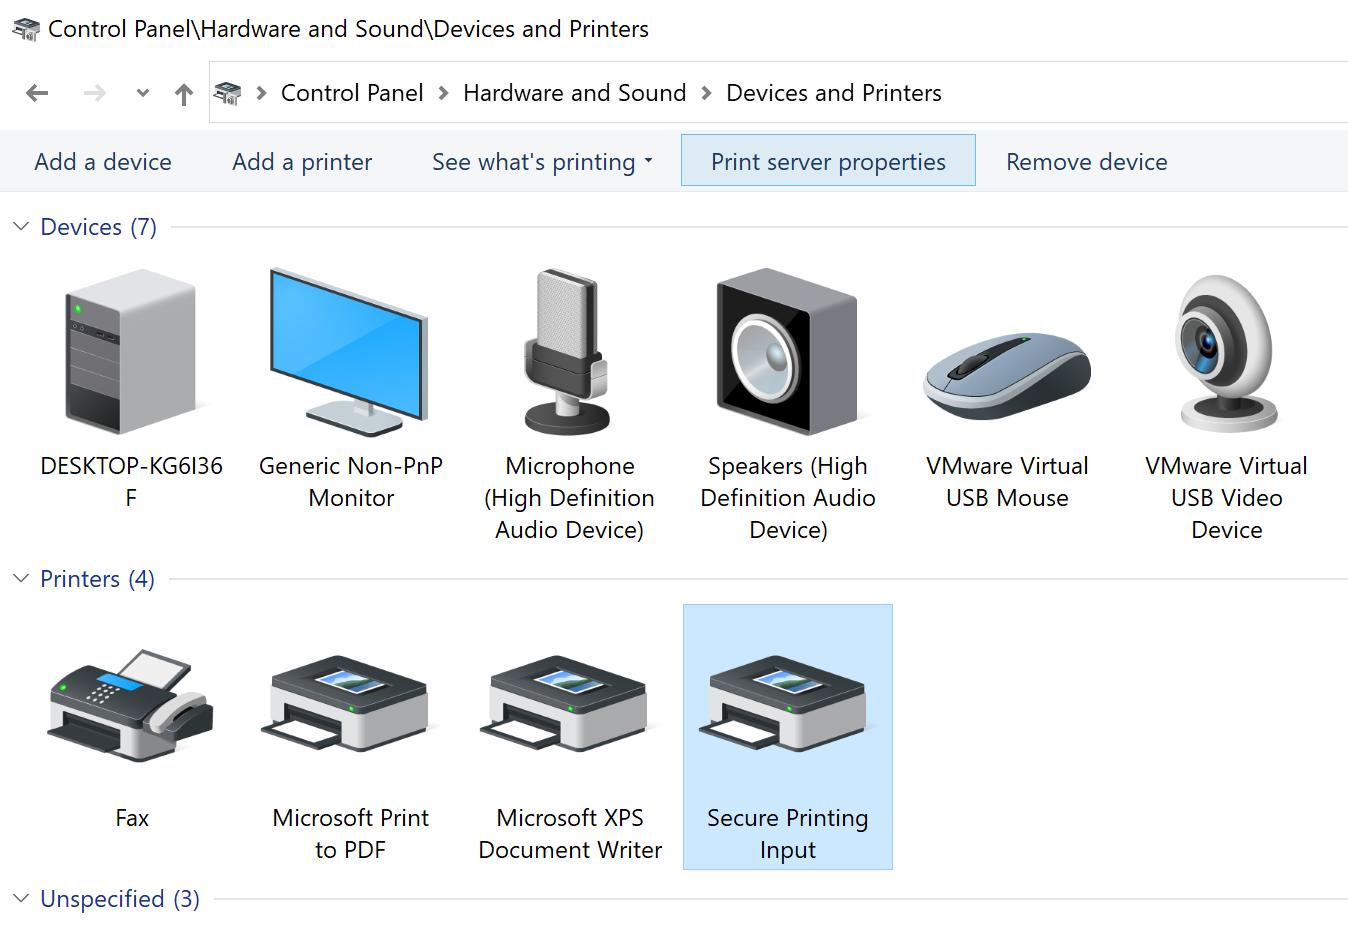 Click Print server properties from the menu bar.